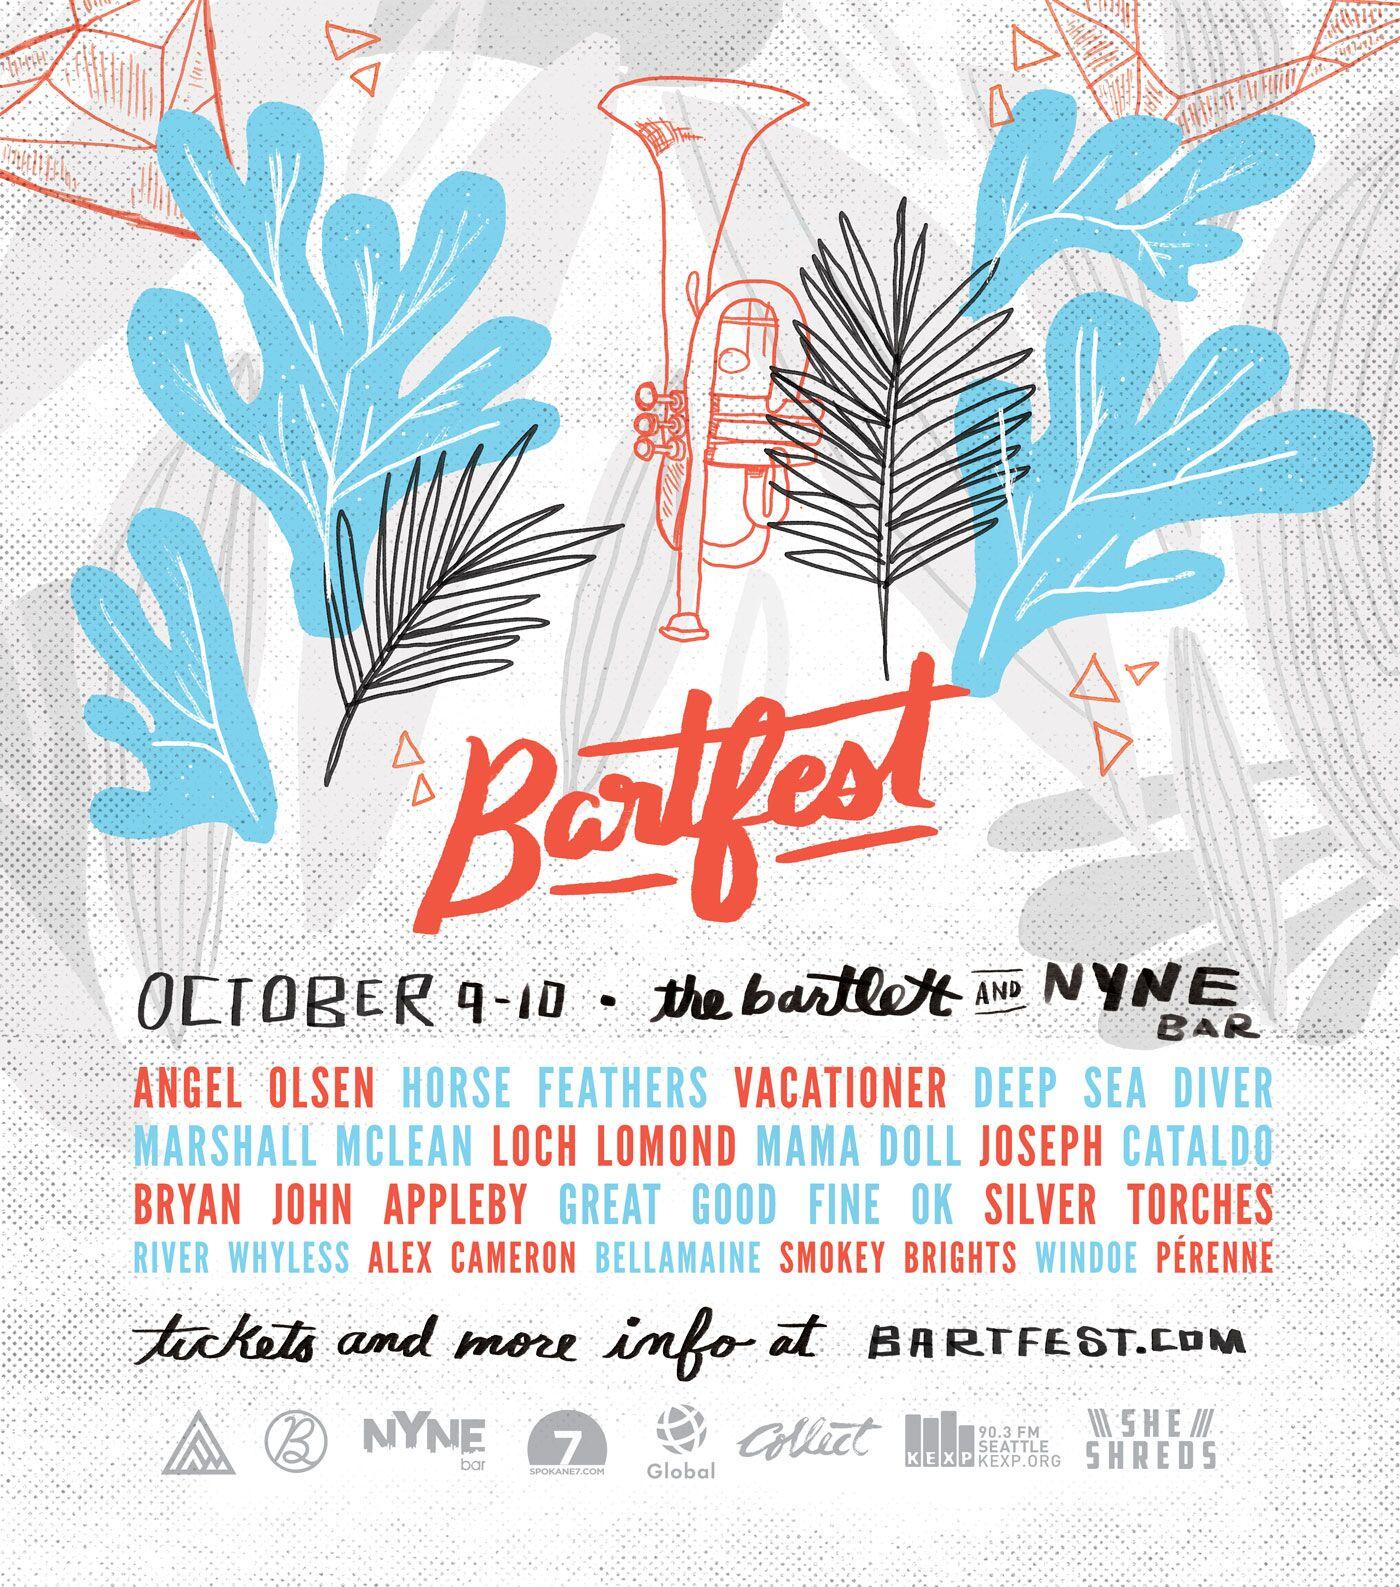 Bartfest 2015